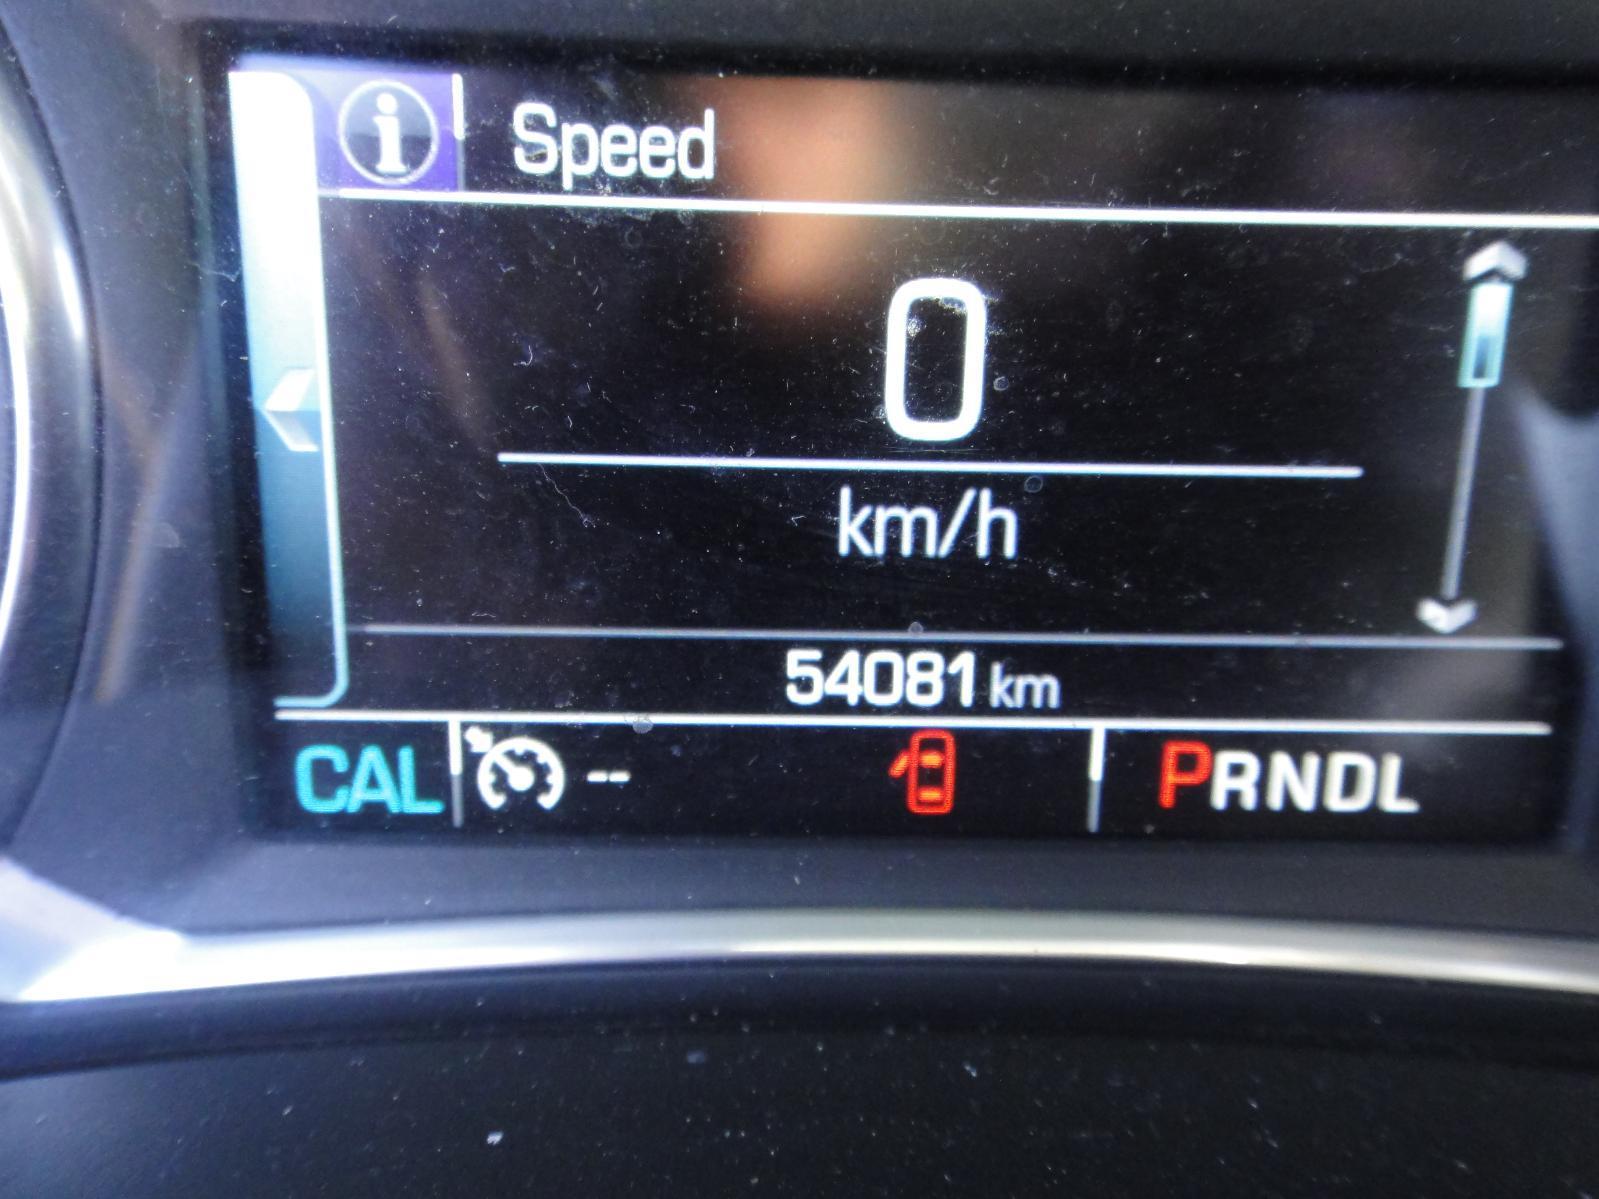 2016 Chevrolet Malibu LT full